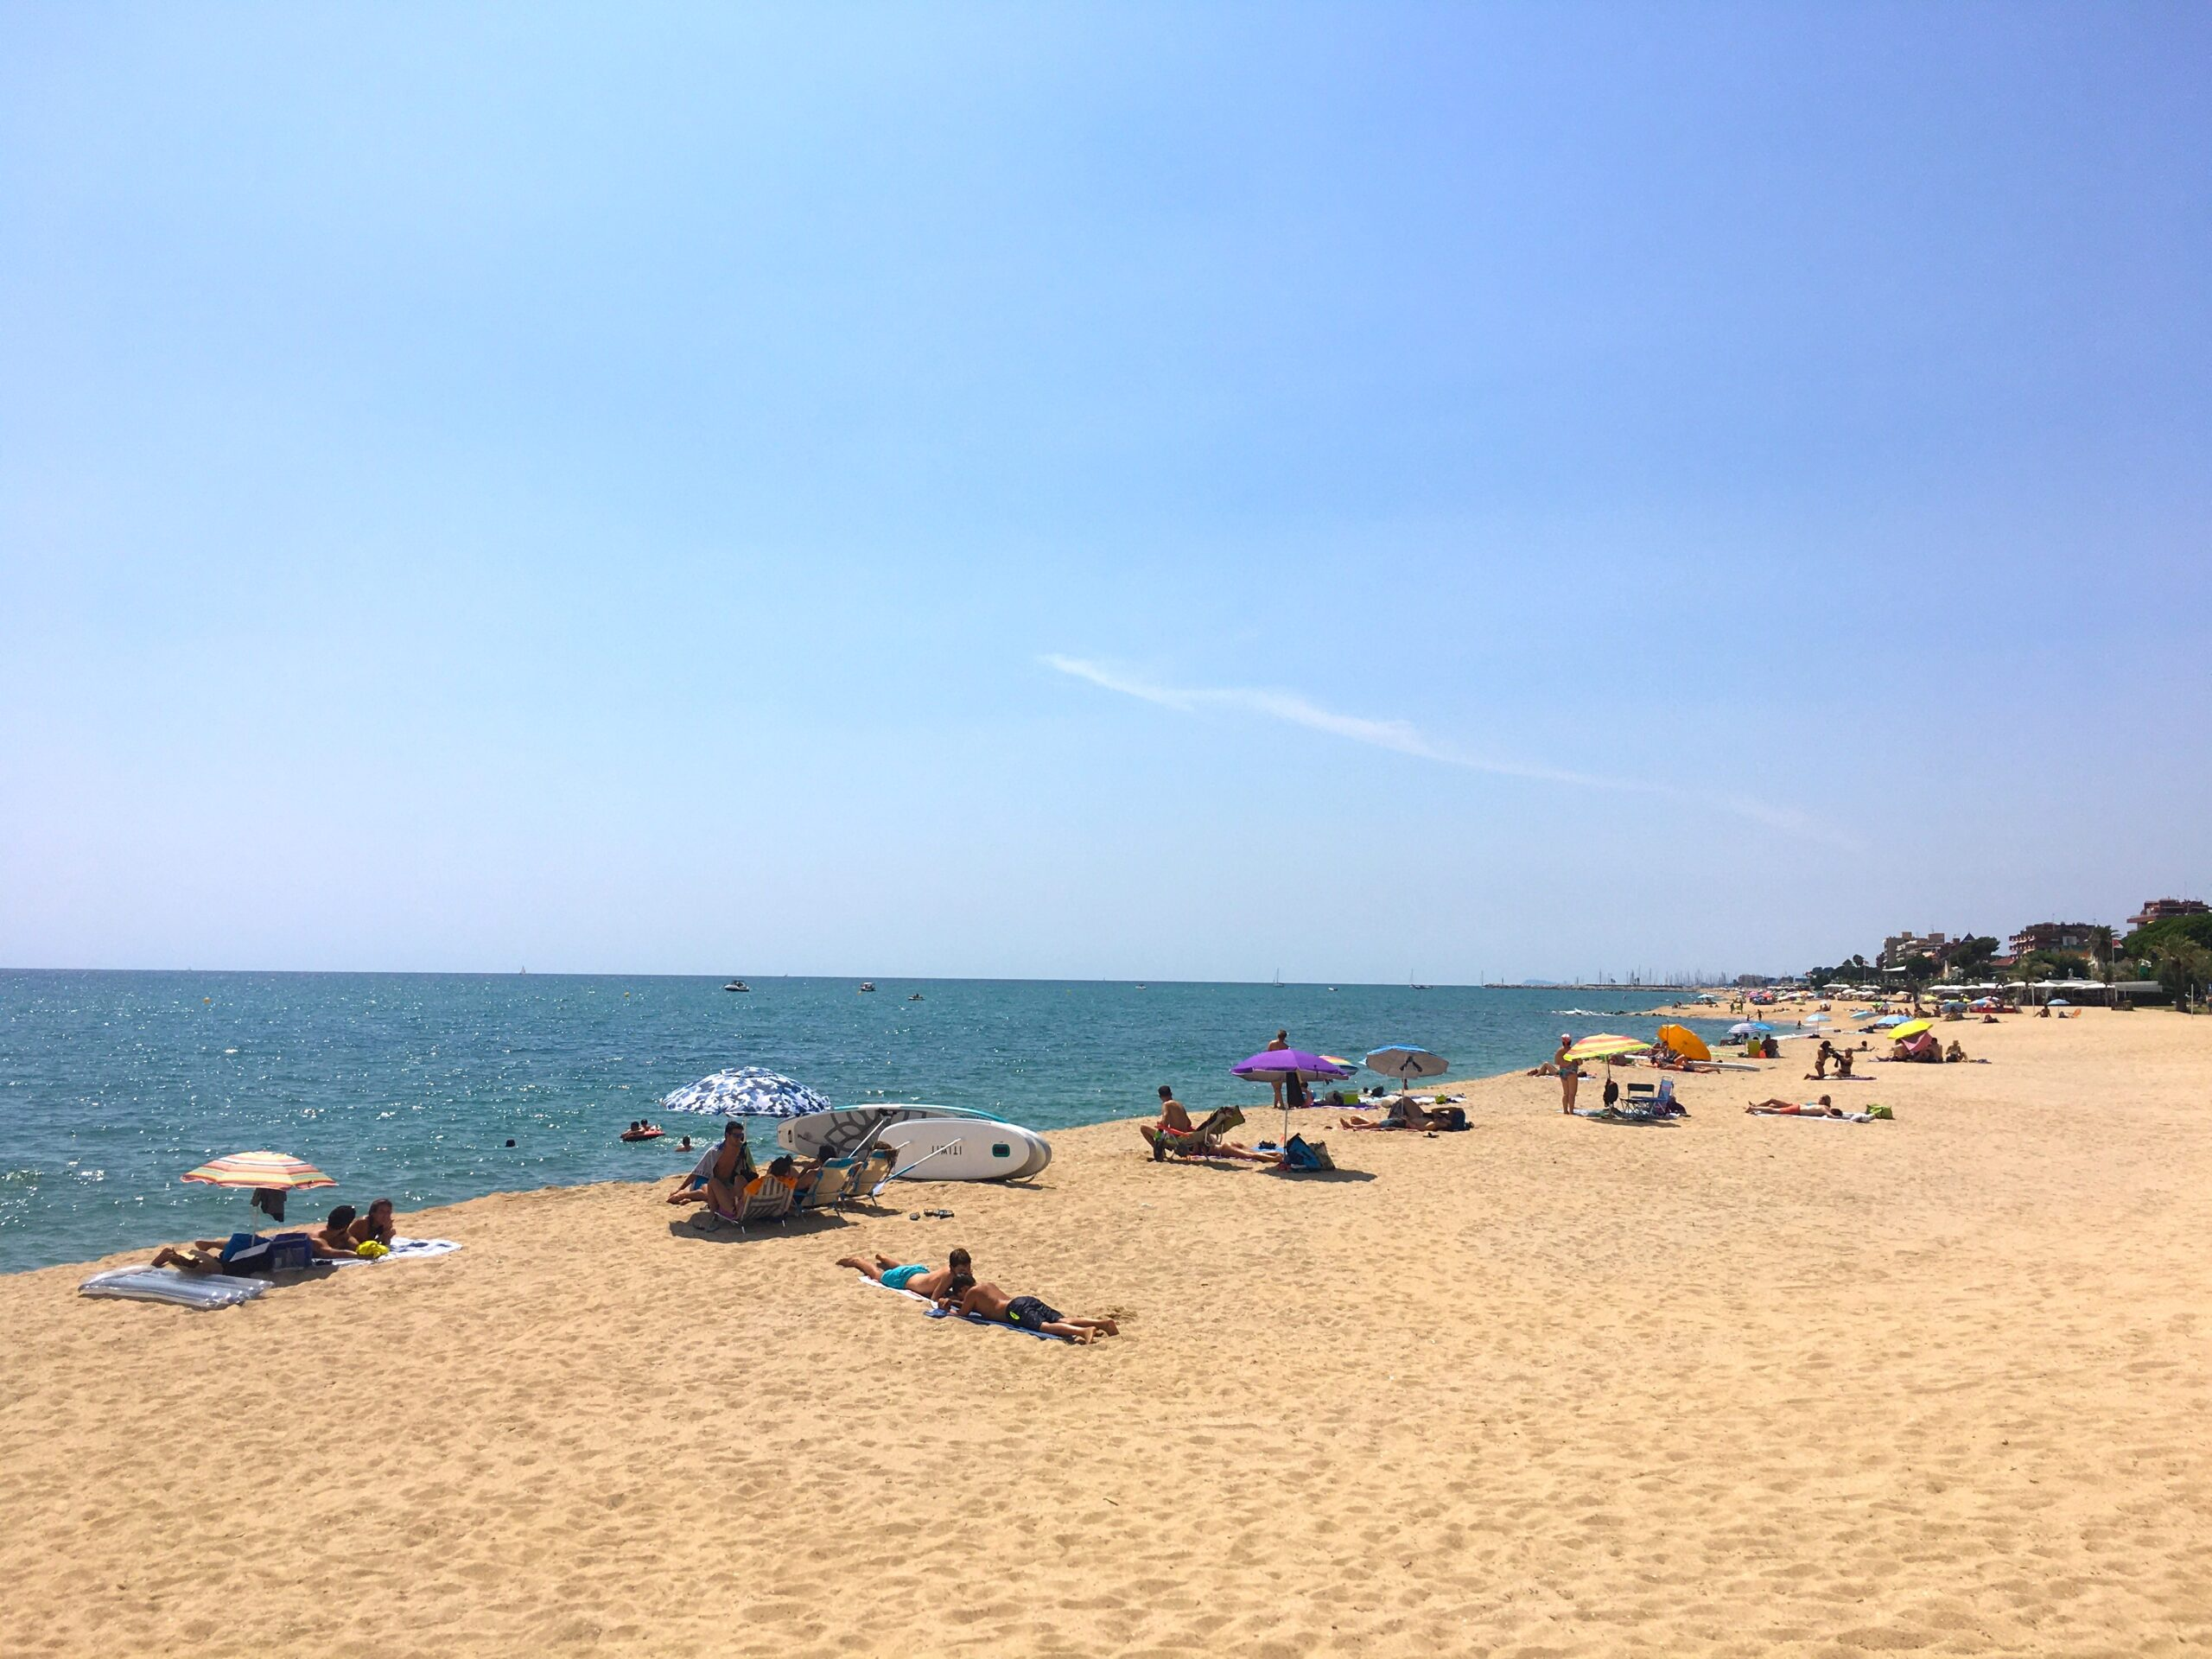 Sandstrand von Caldes d'Estrac_Abschnitt Platja los tres Micos